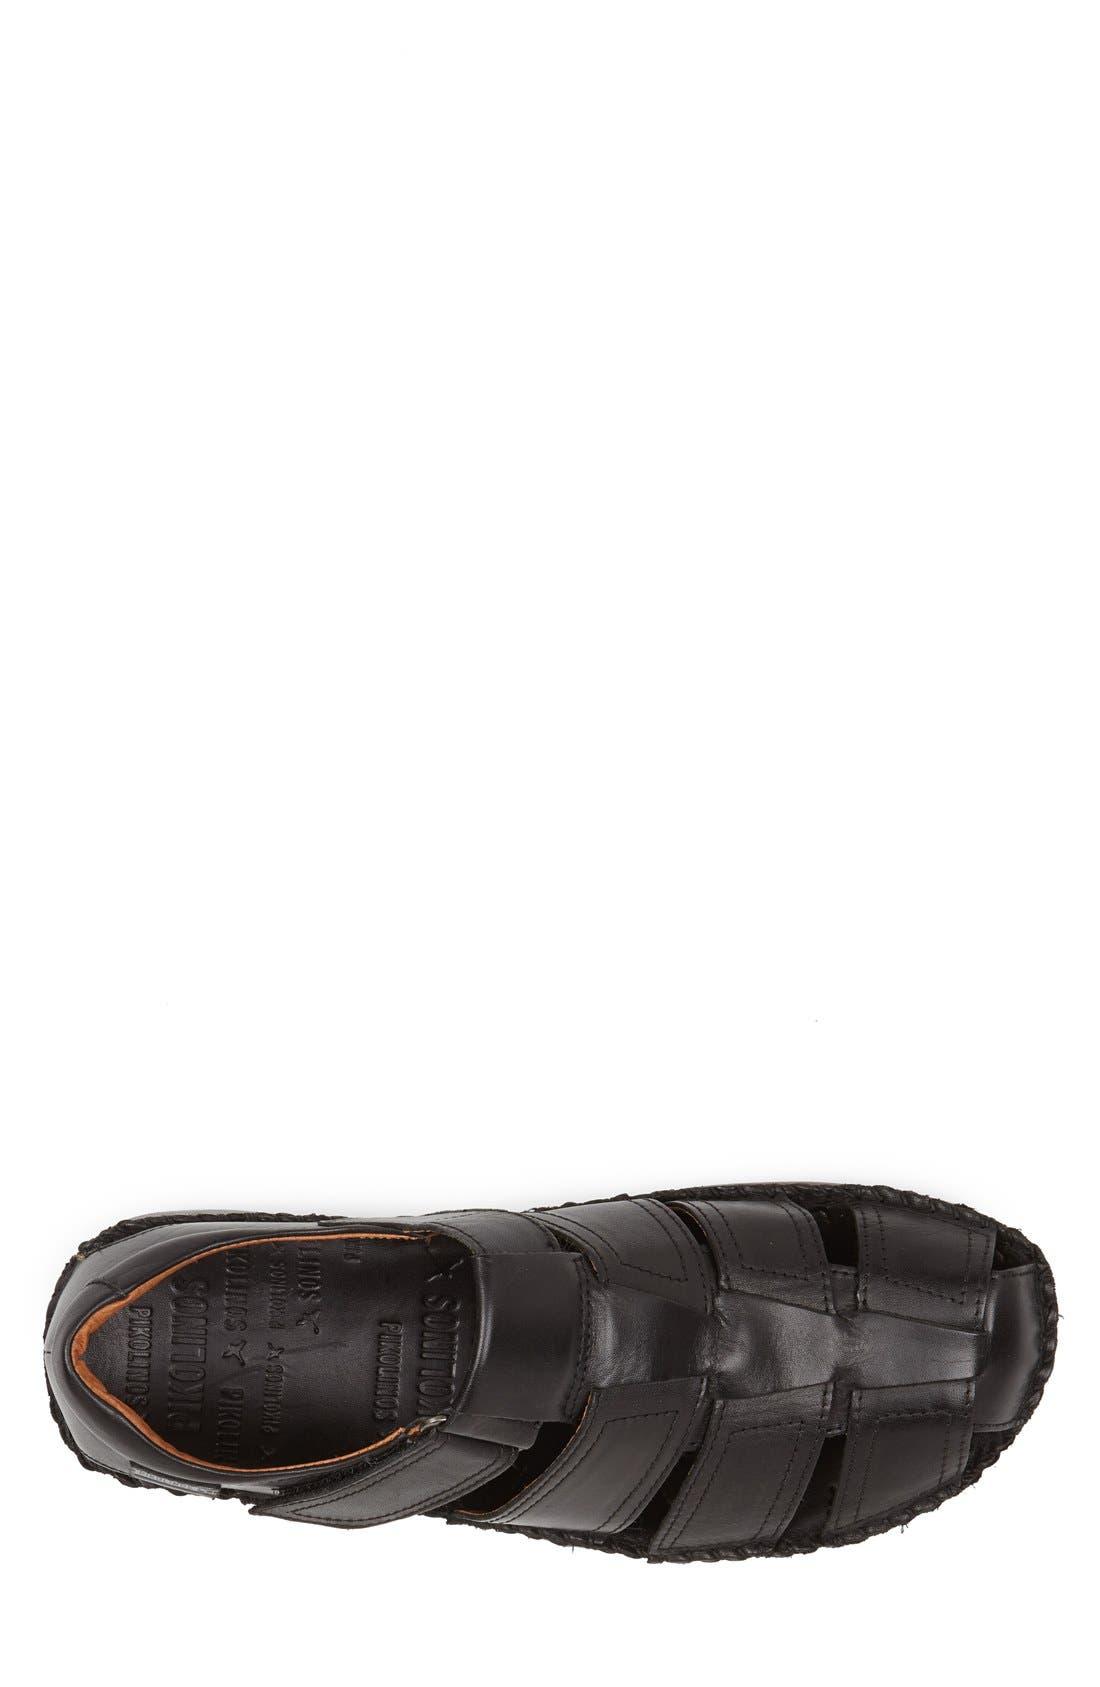 Alternate Image 3  - PIKOLINOS 'Tarifa' Sandal